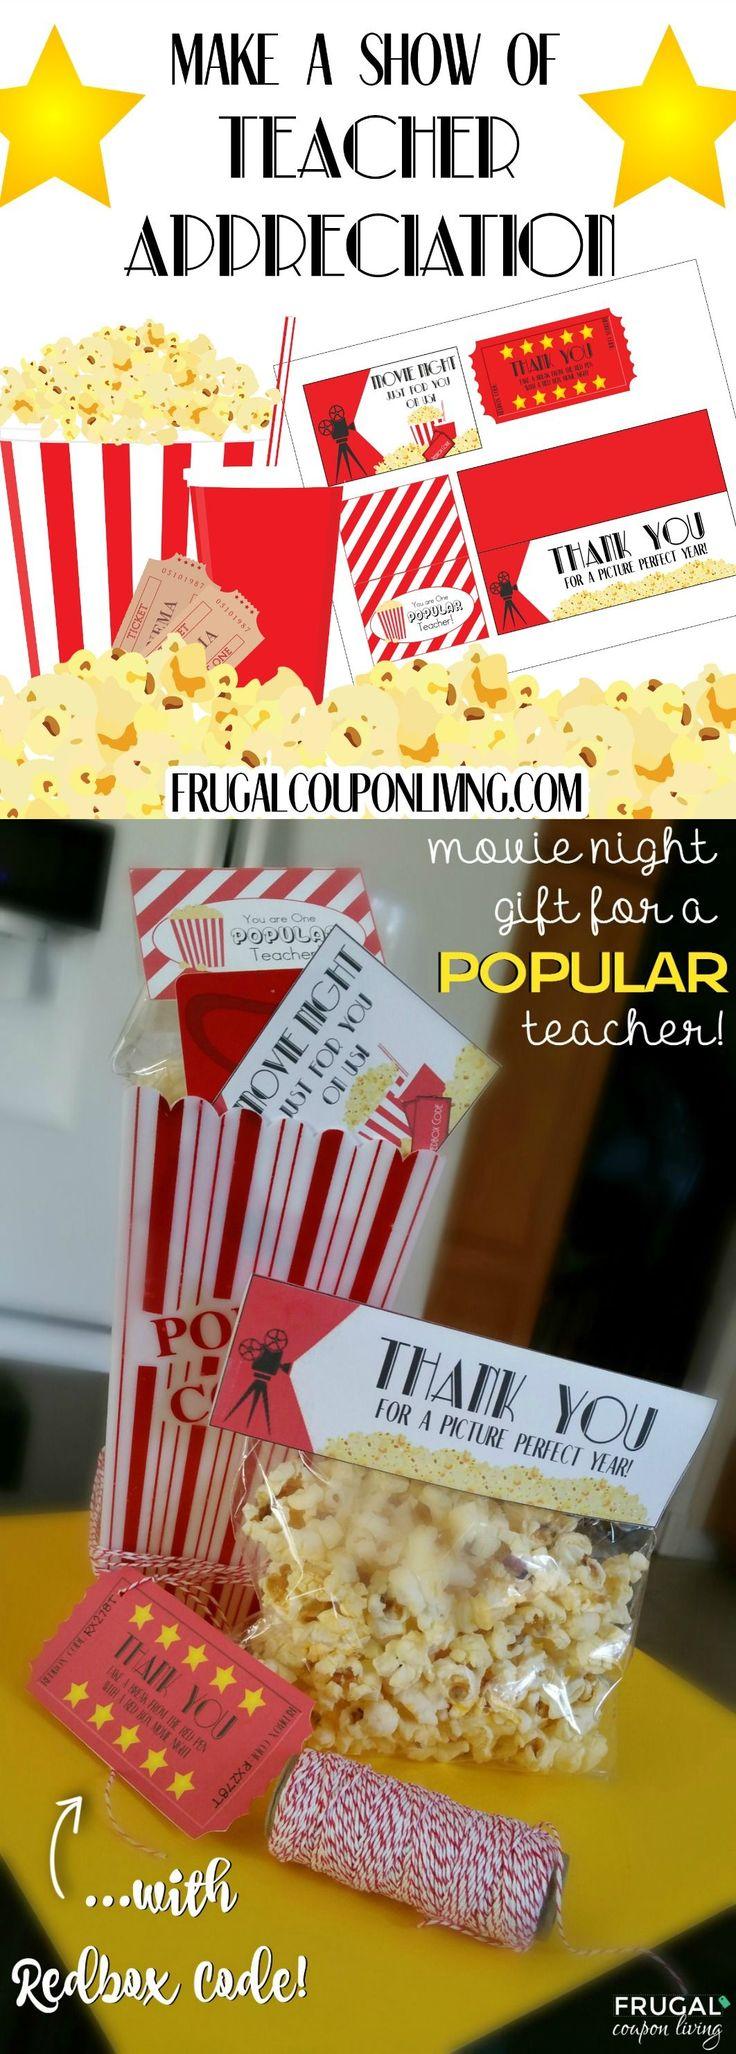 Looking for a fun way to celebrate a teacher? Print your freeMovie Night Teacher Appreciation Gift for a POPULAR teacher. Redbox Code Gift Idea. #teacherappreciationgifts